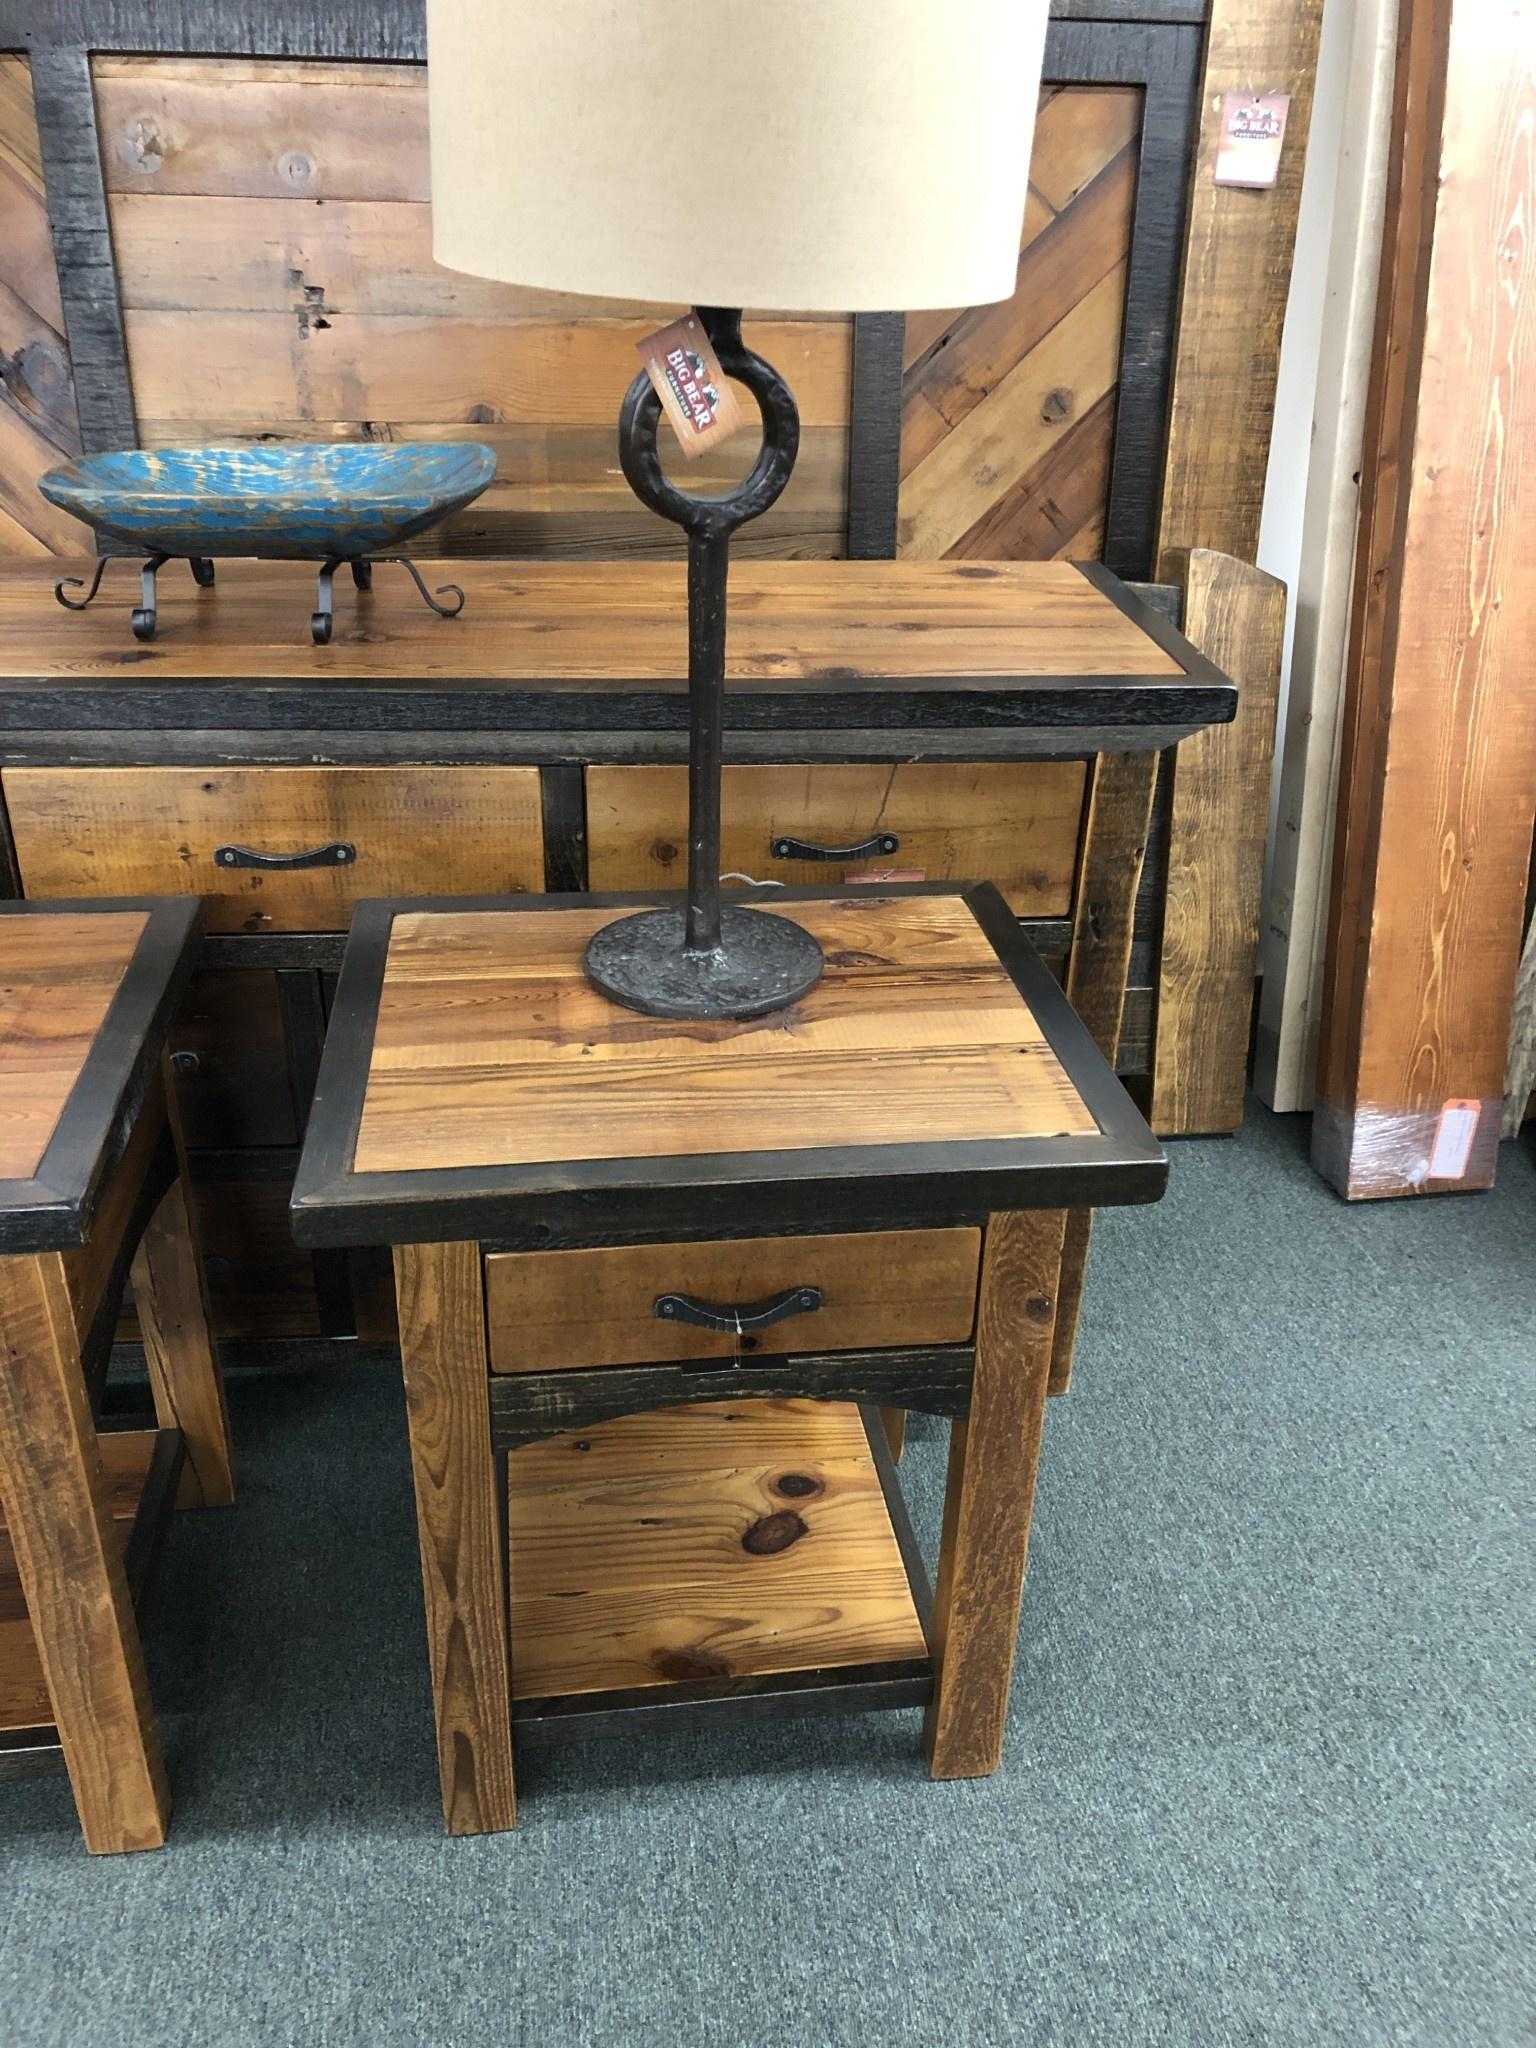 Green Gables Mossy Oak Natchez Trace 1 Dwr Nightstand w/shelf